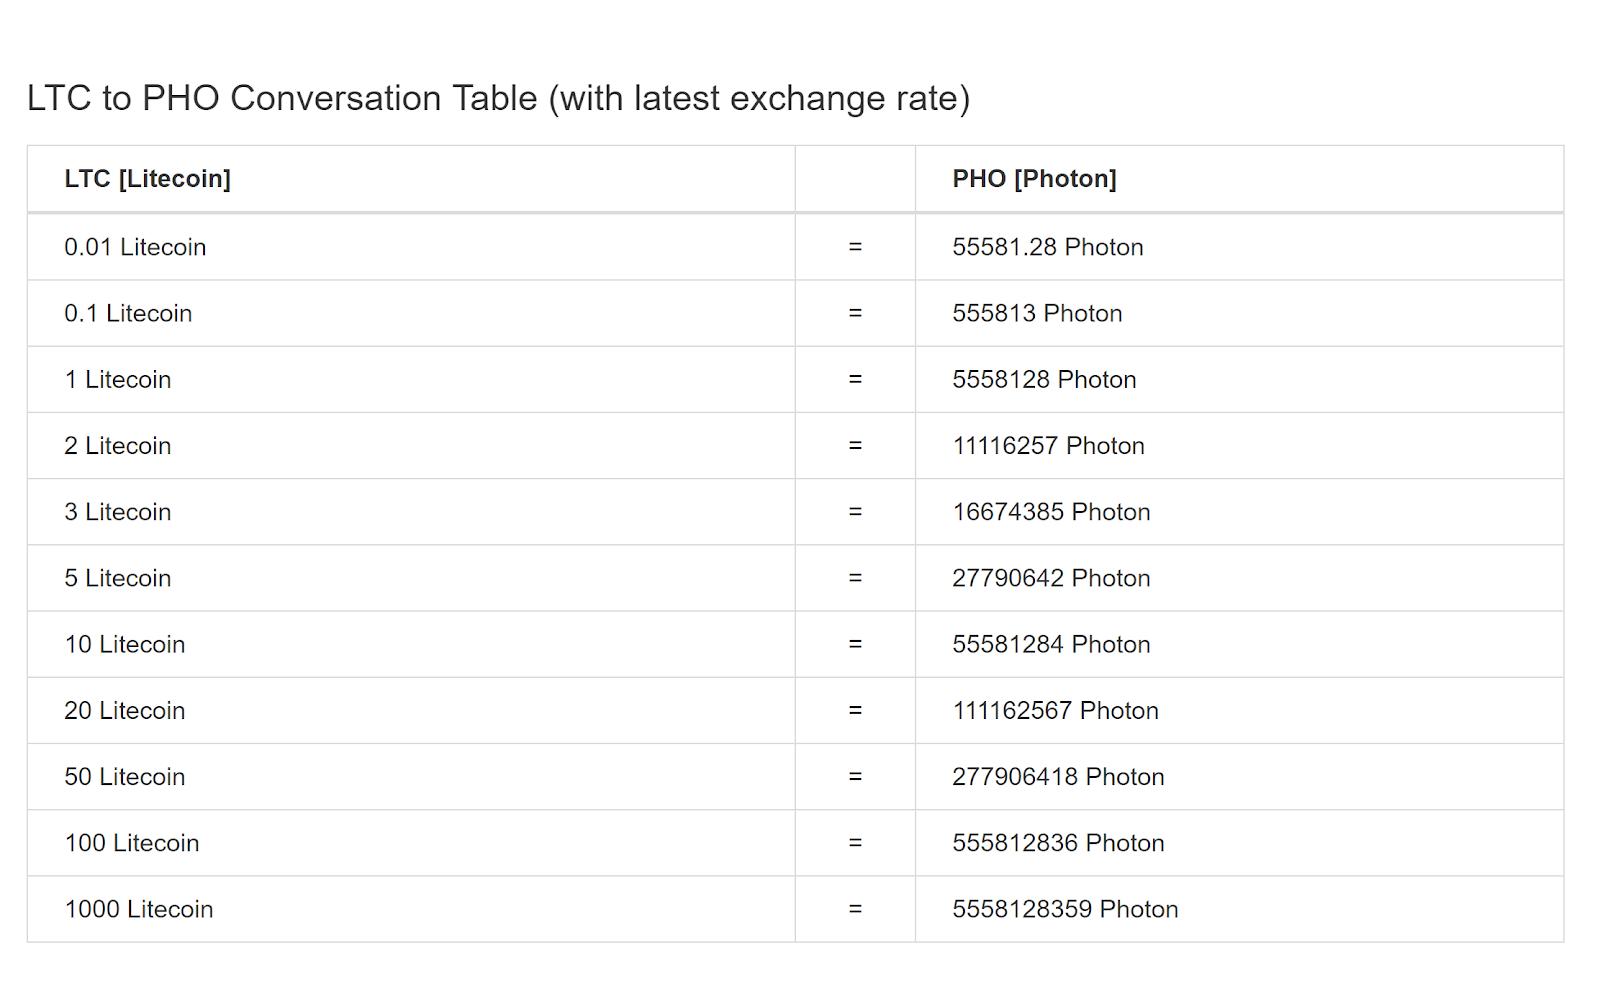 Litecoin to Photon conversion table